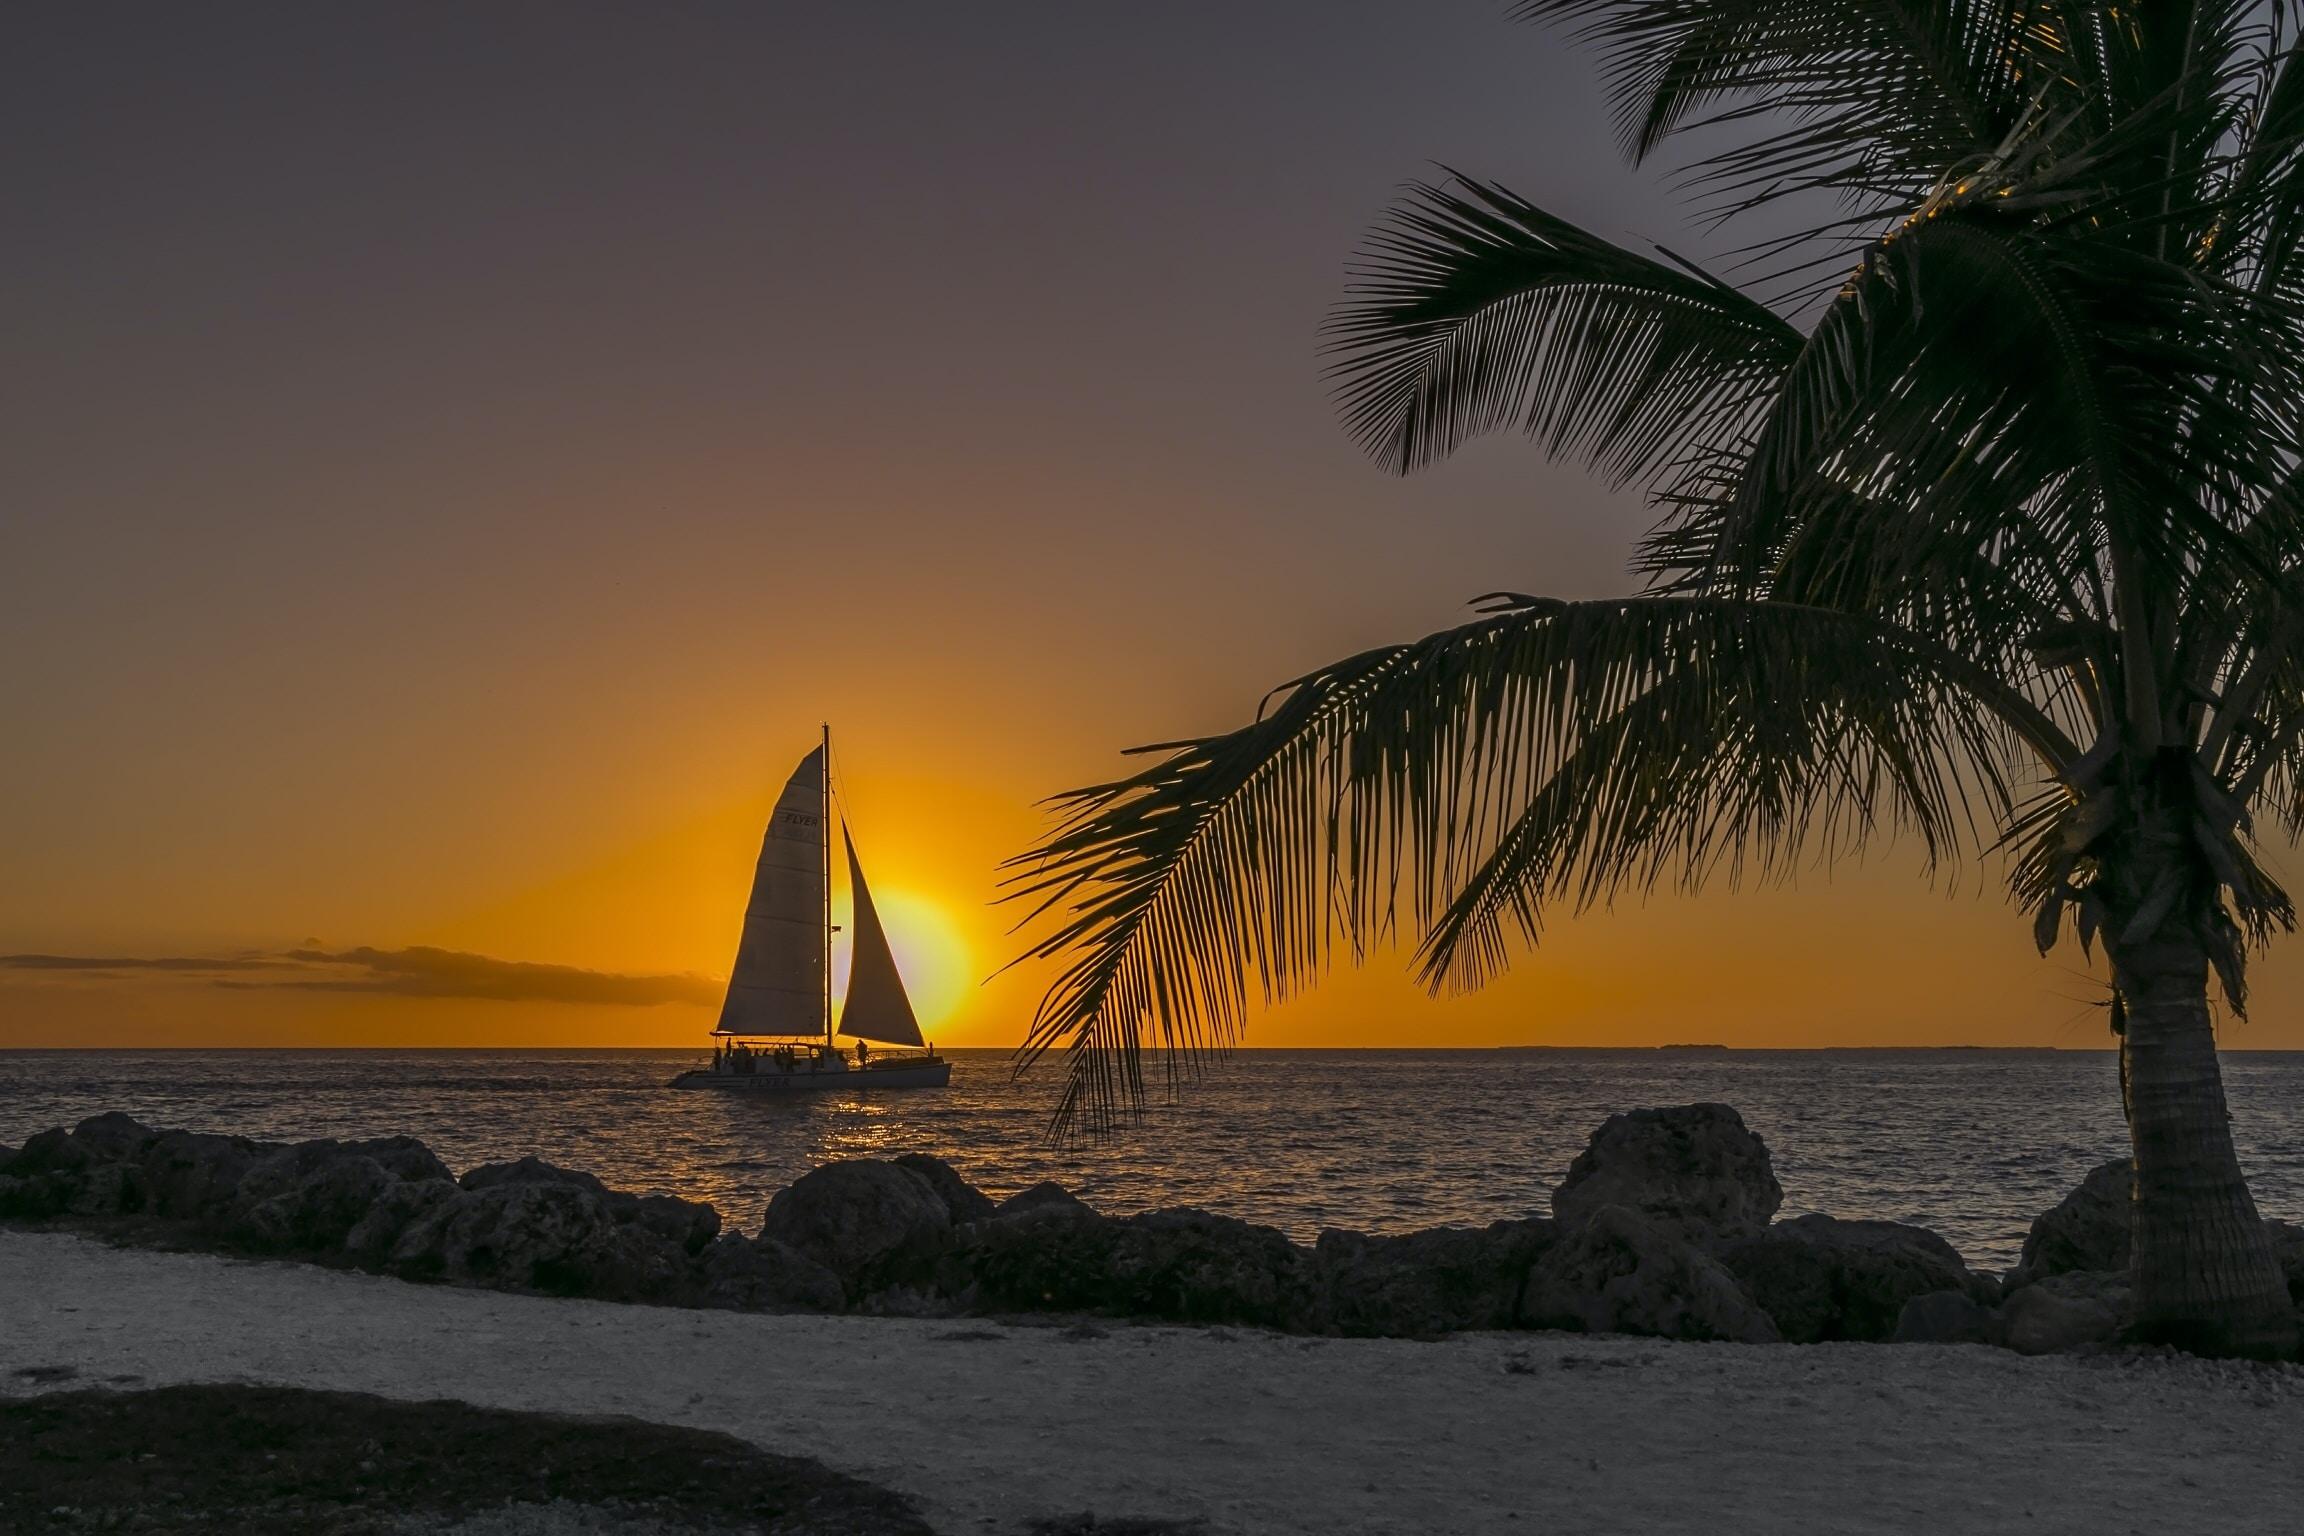 sailboat at sea near seashore